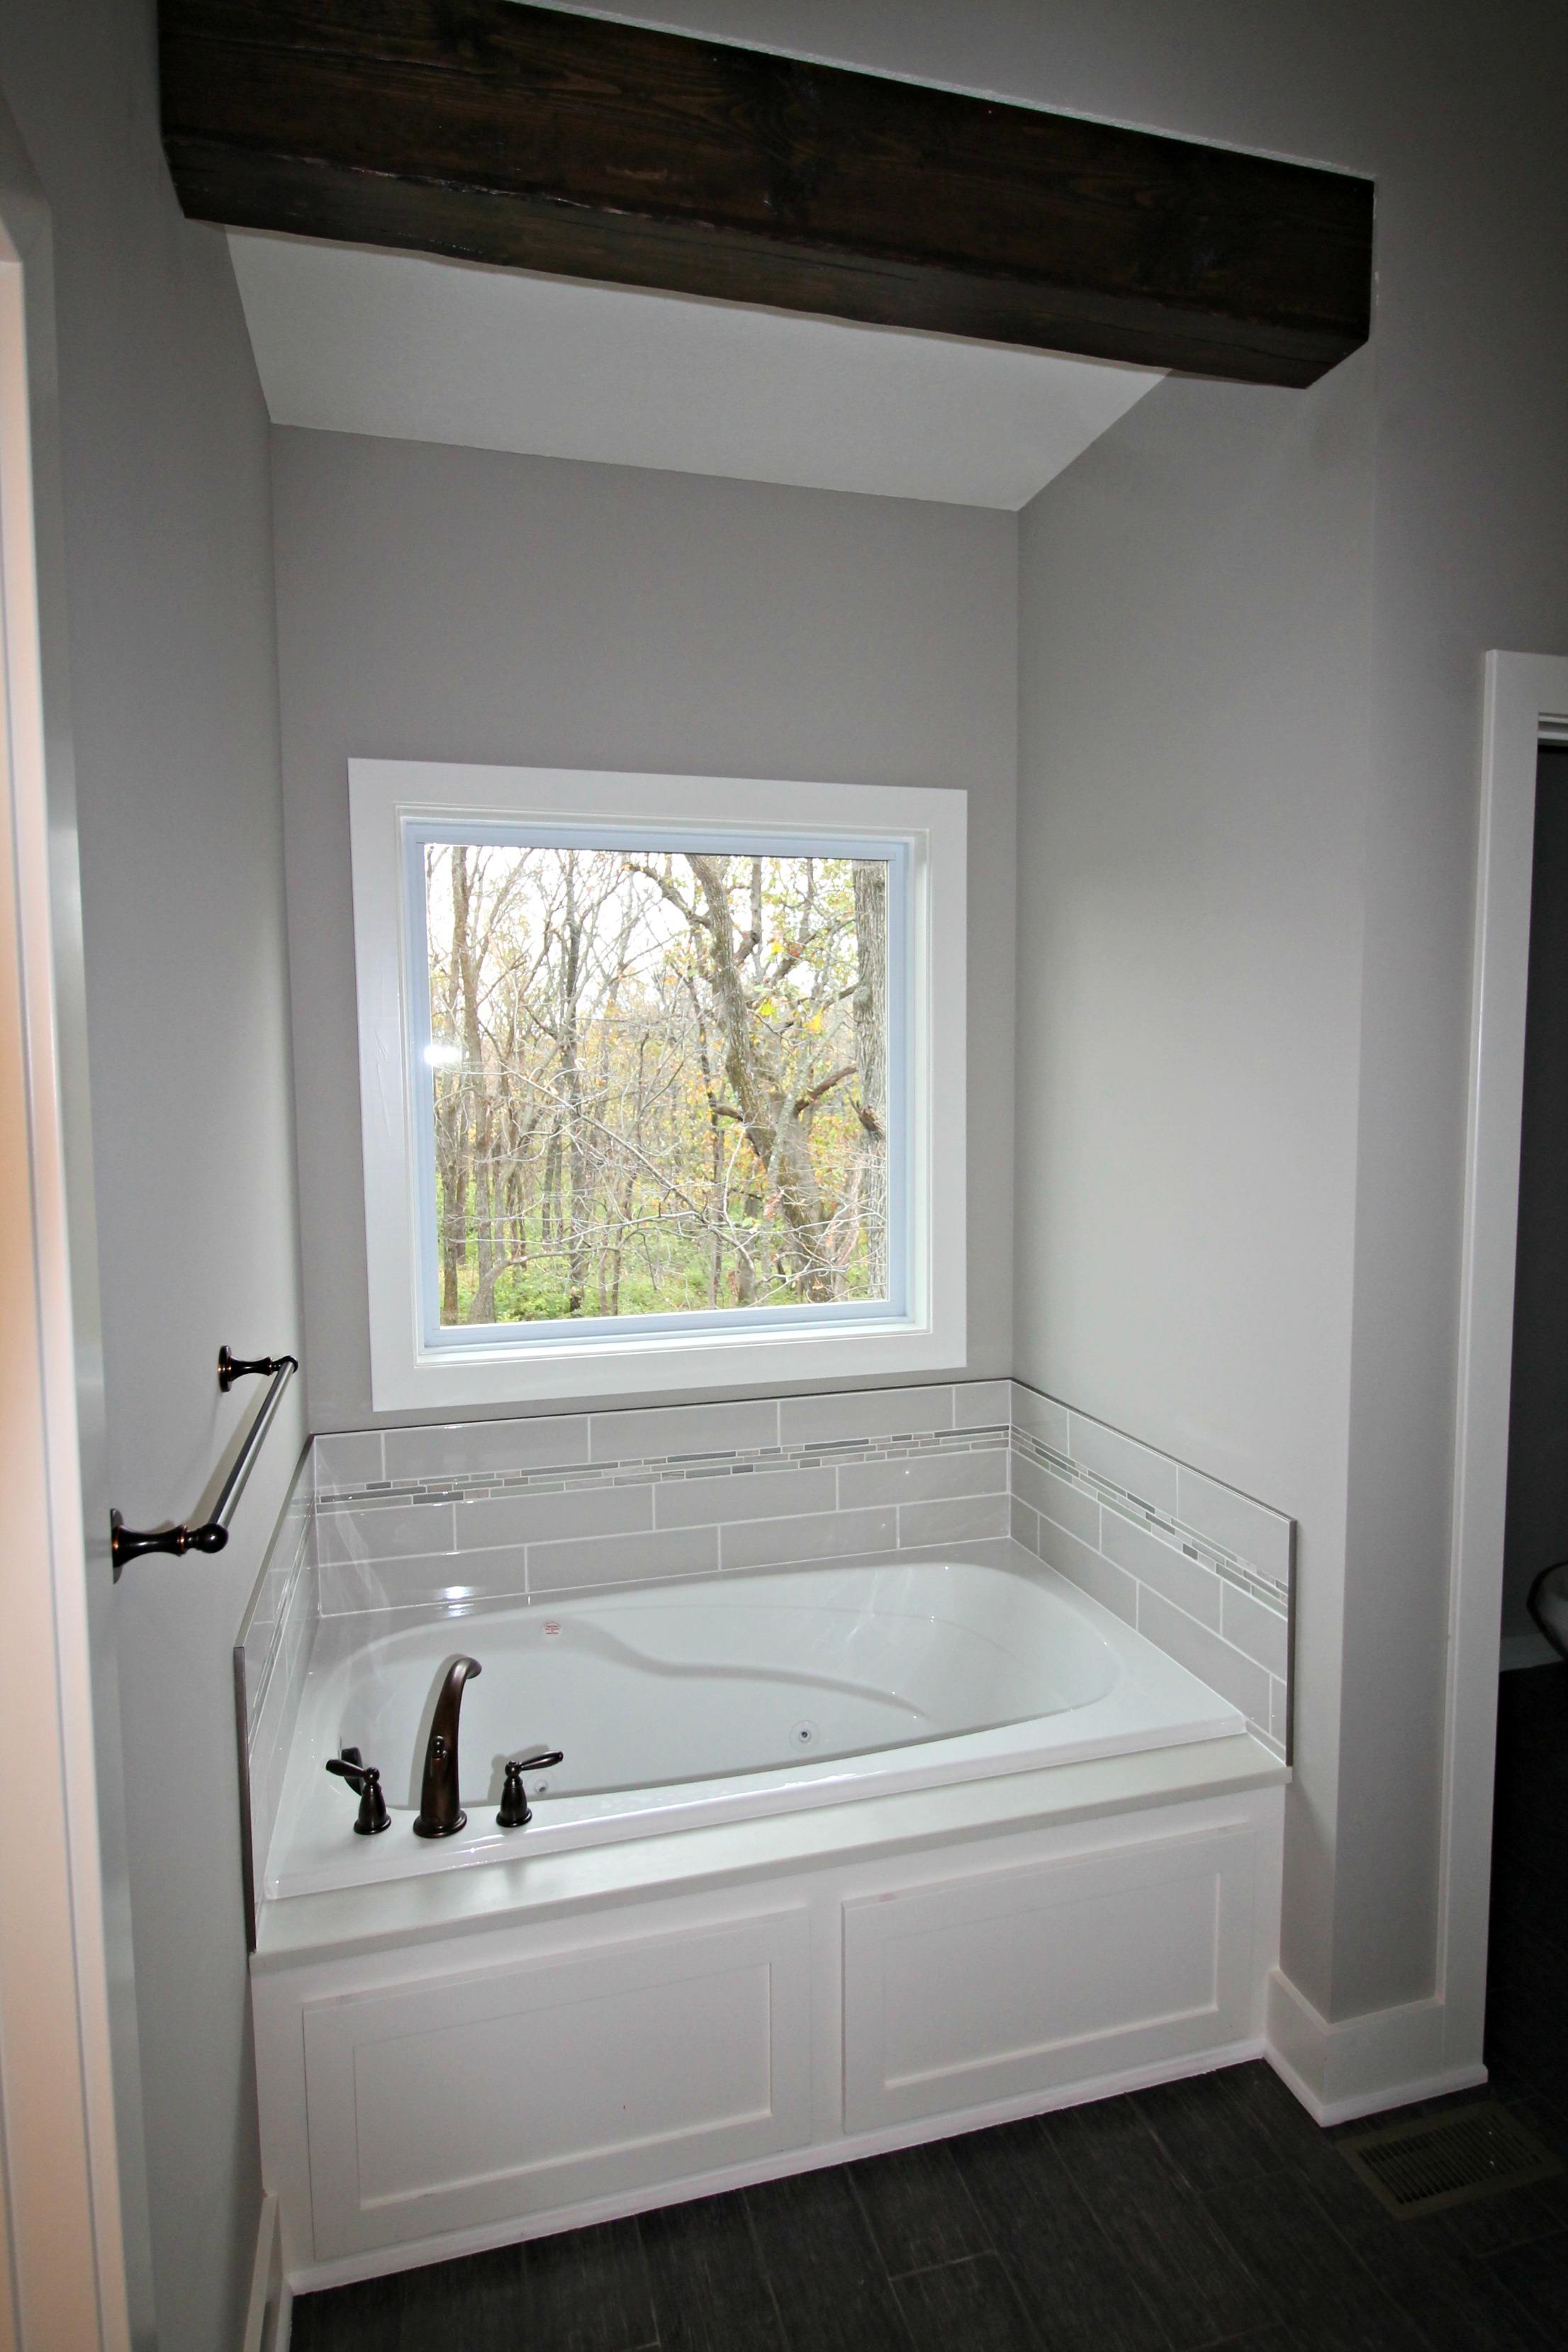 Lot 36 Bathtub